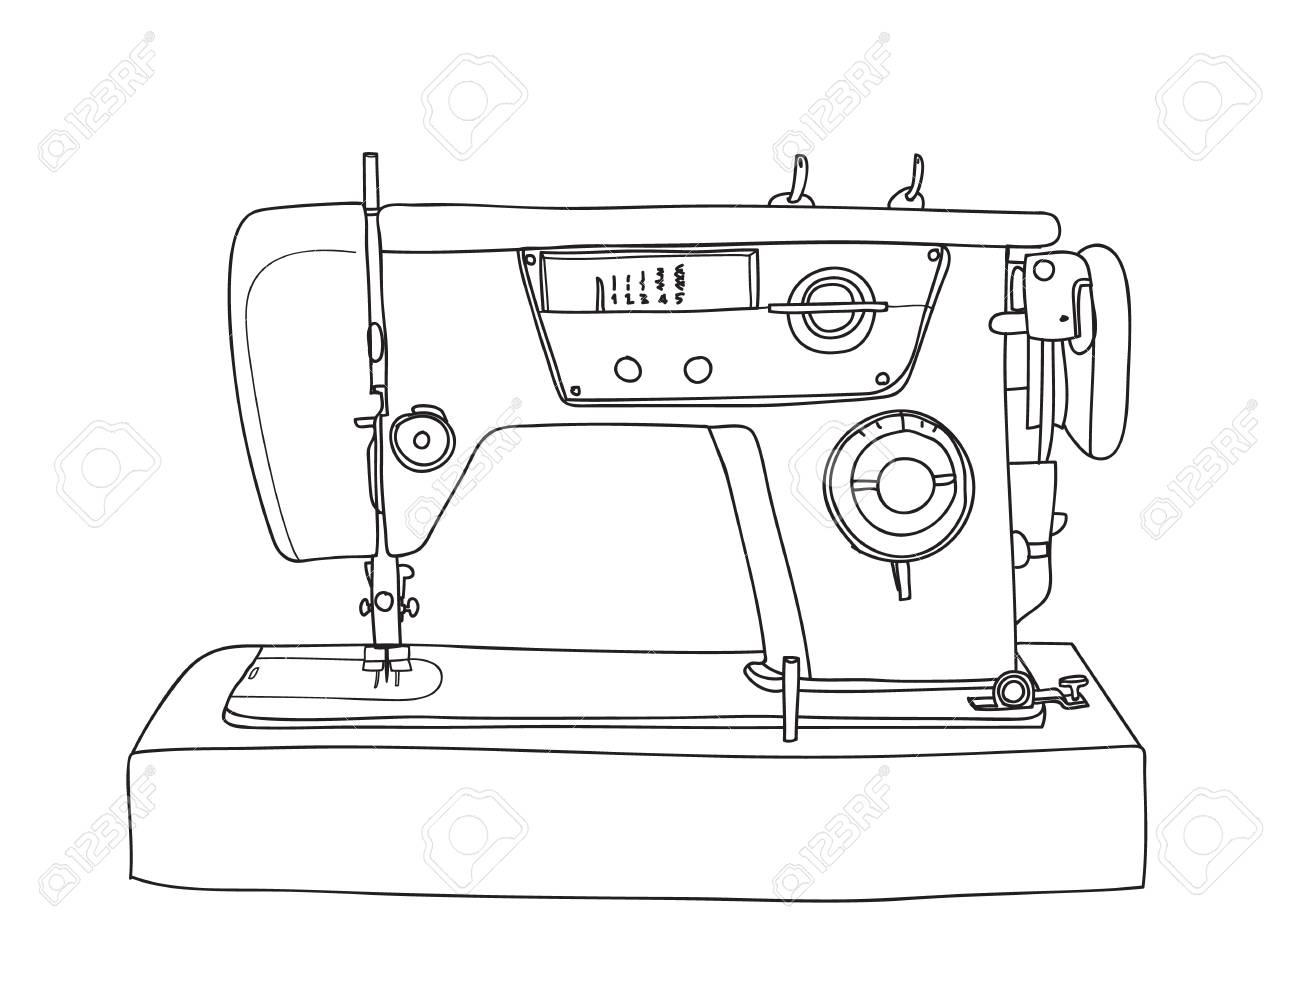 Sewing Machine Drawing At Getdrawings